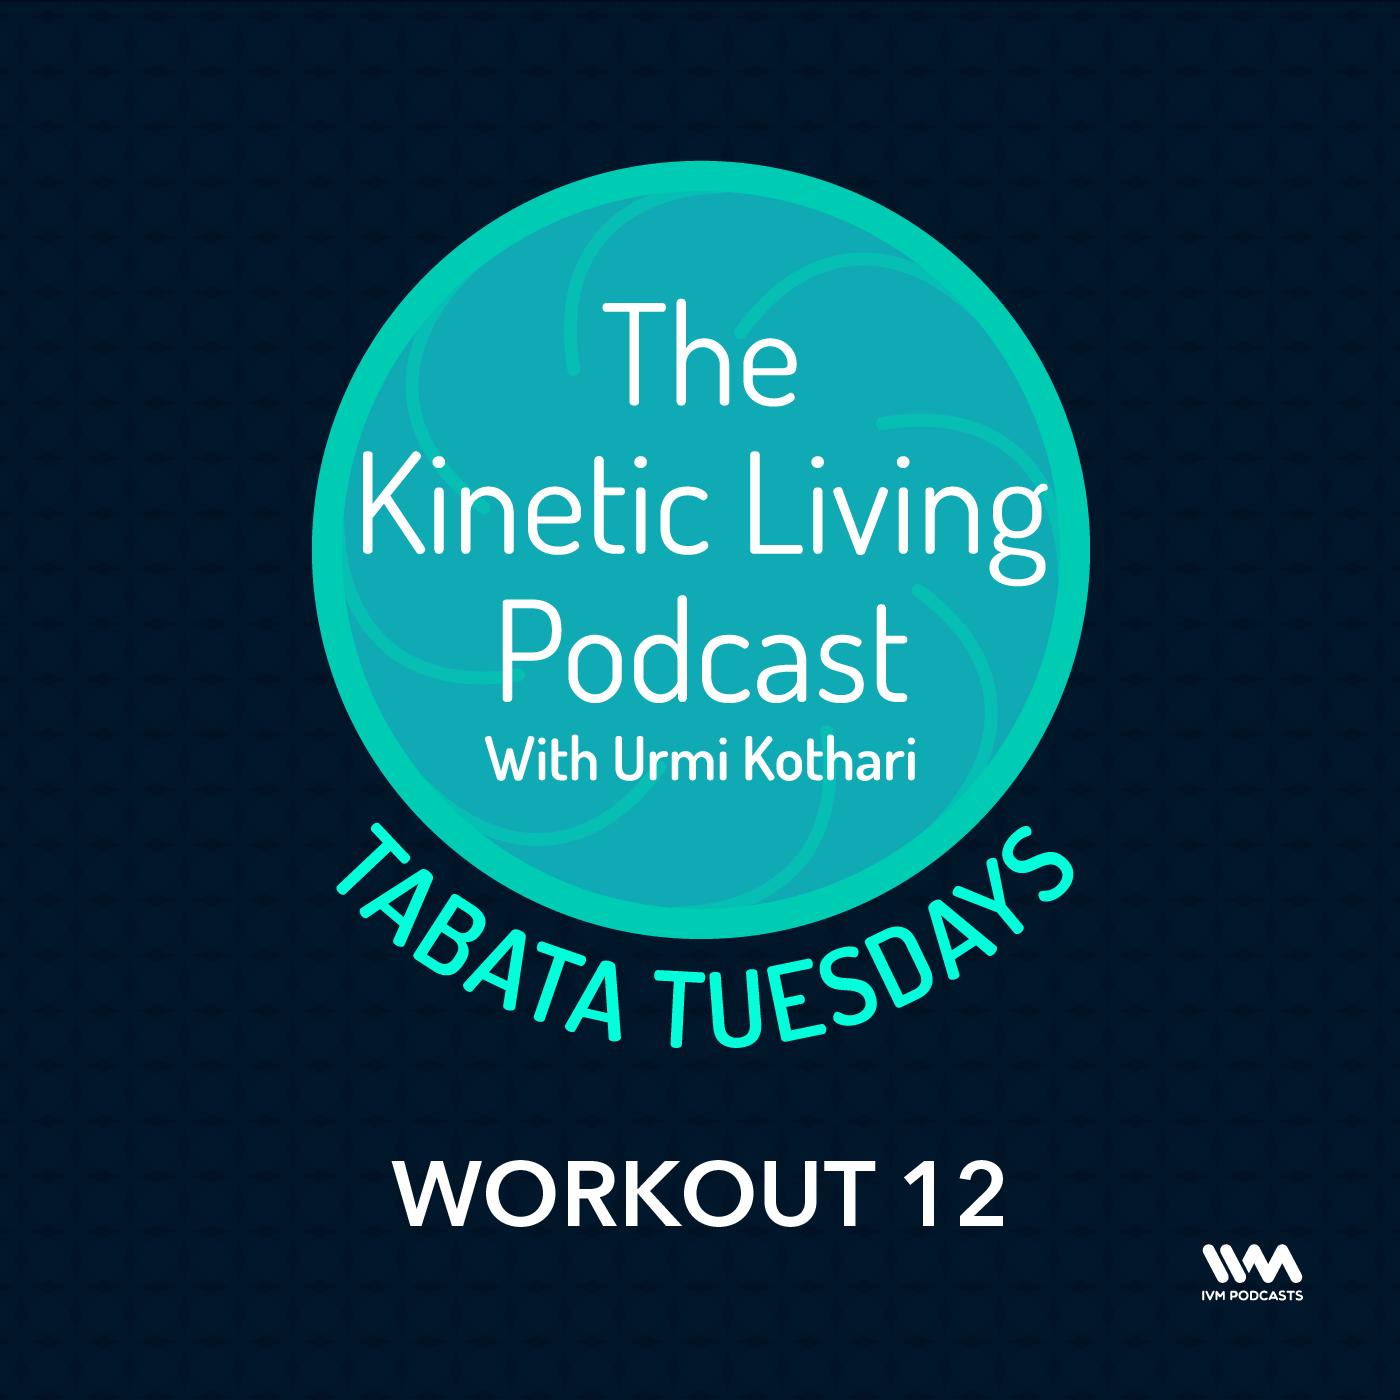 S02 E12: Tabata Tuesday: Workout 12